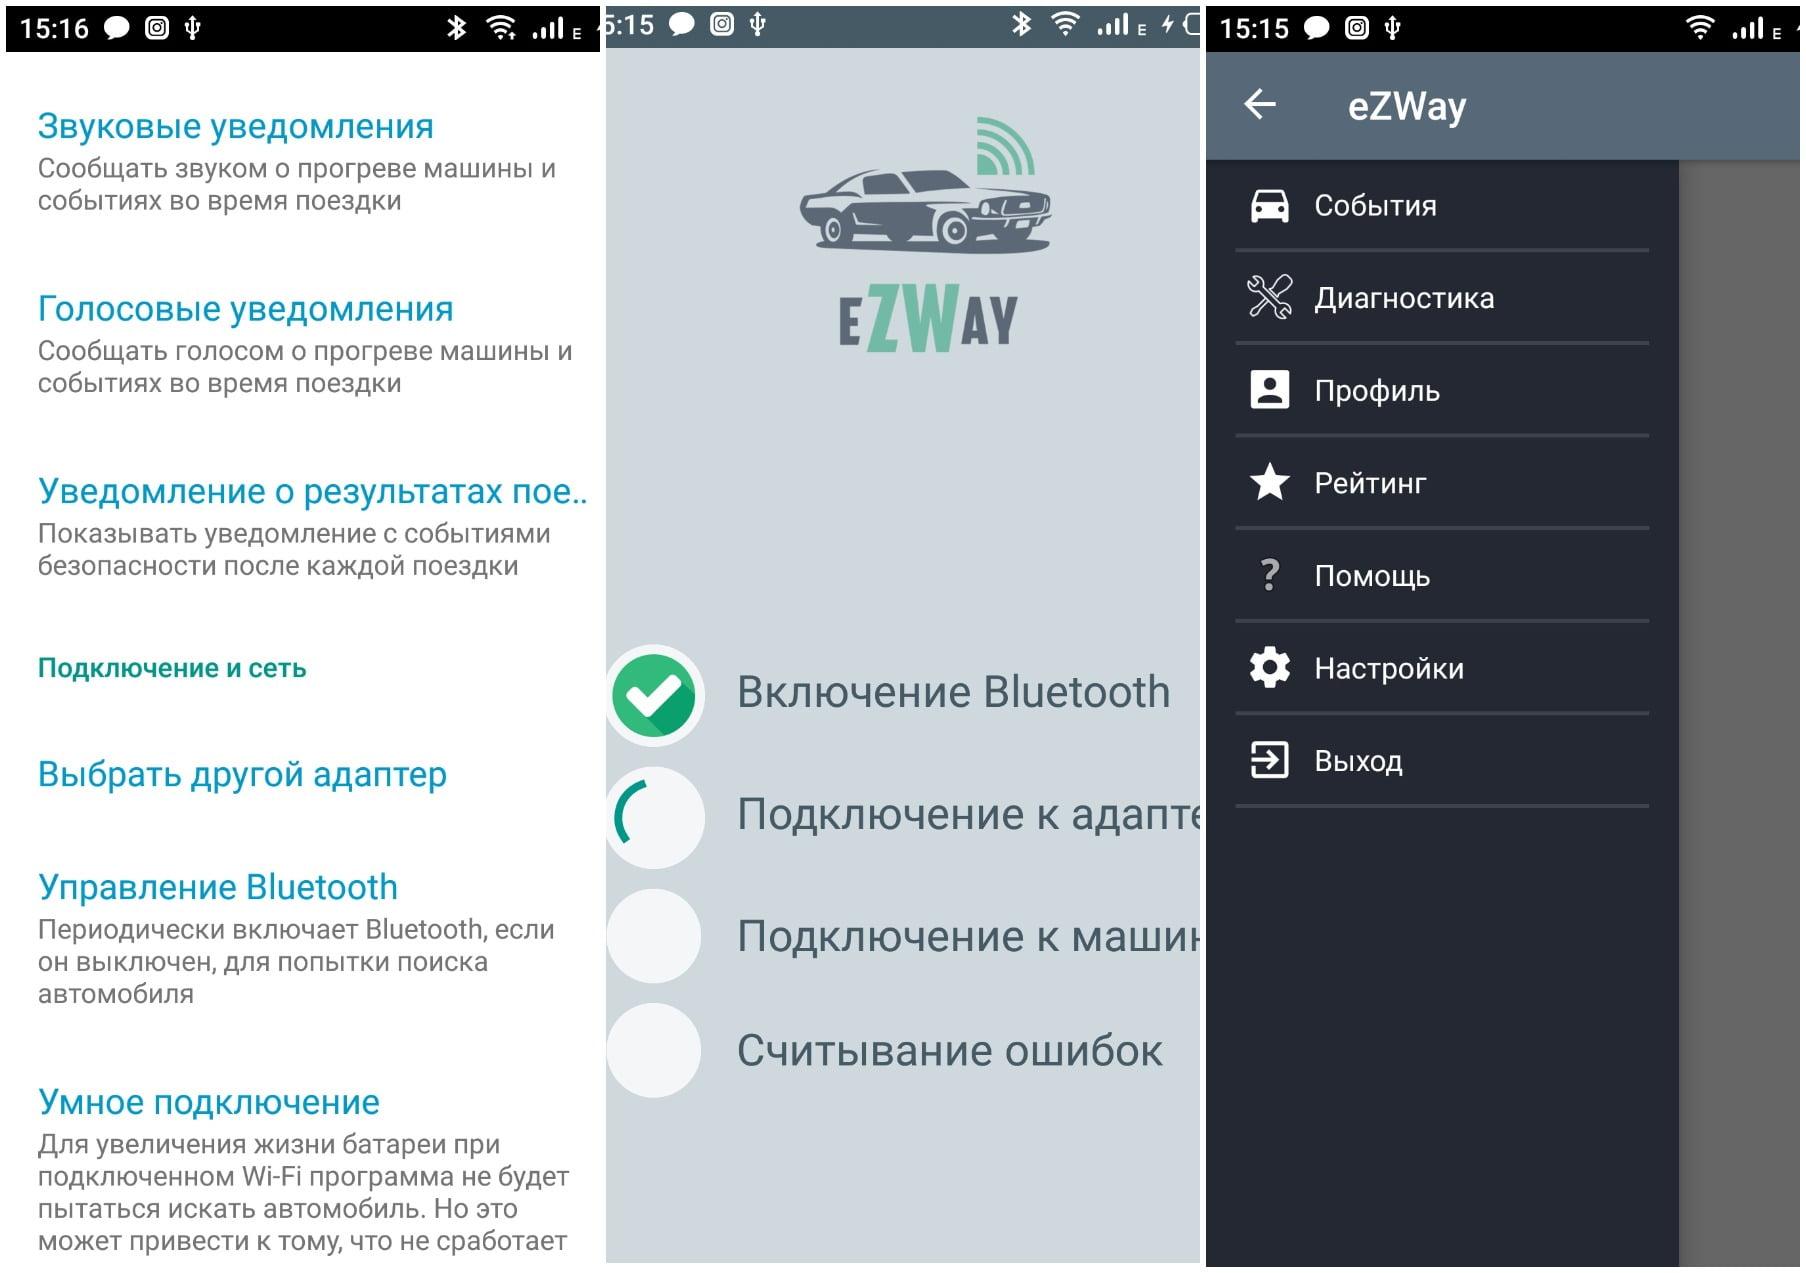 На фото приложение Ezway